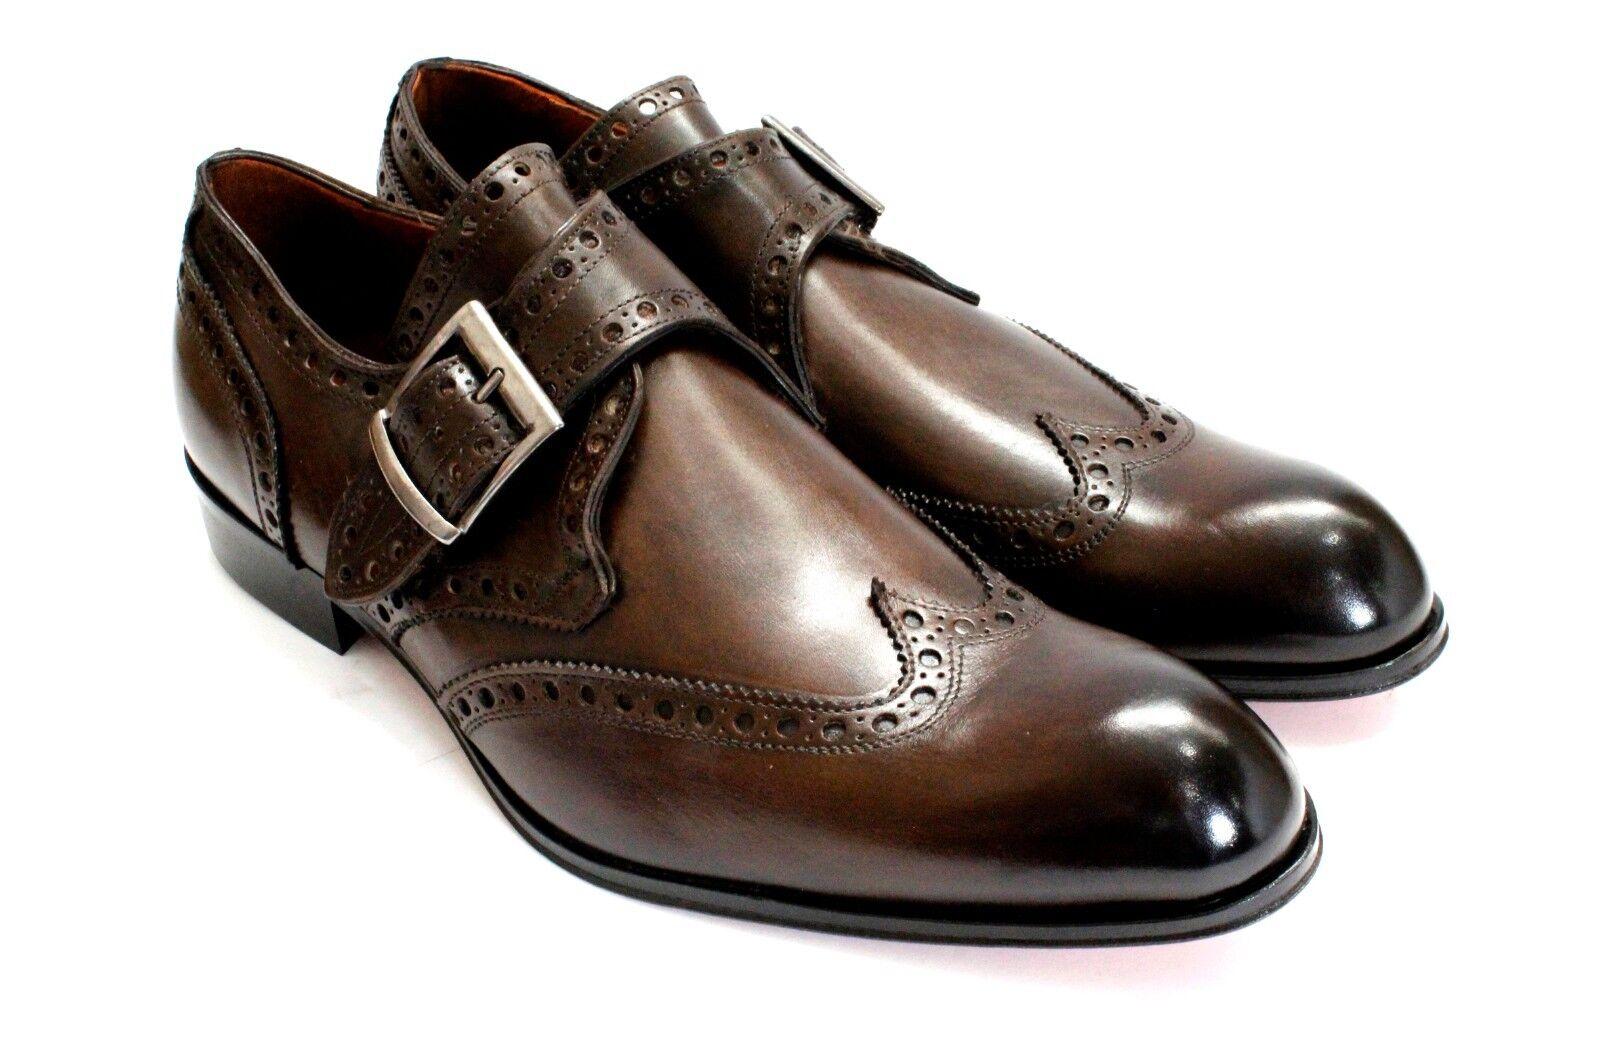 Ivan Troy Café Hecho a Mano Monje Tira Cuero Italiano Zapatos Vestido Zapatos